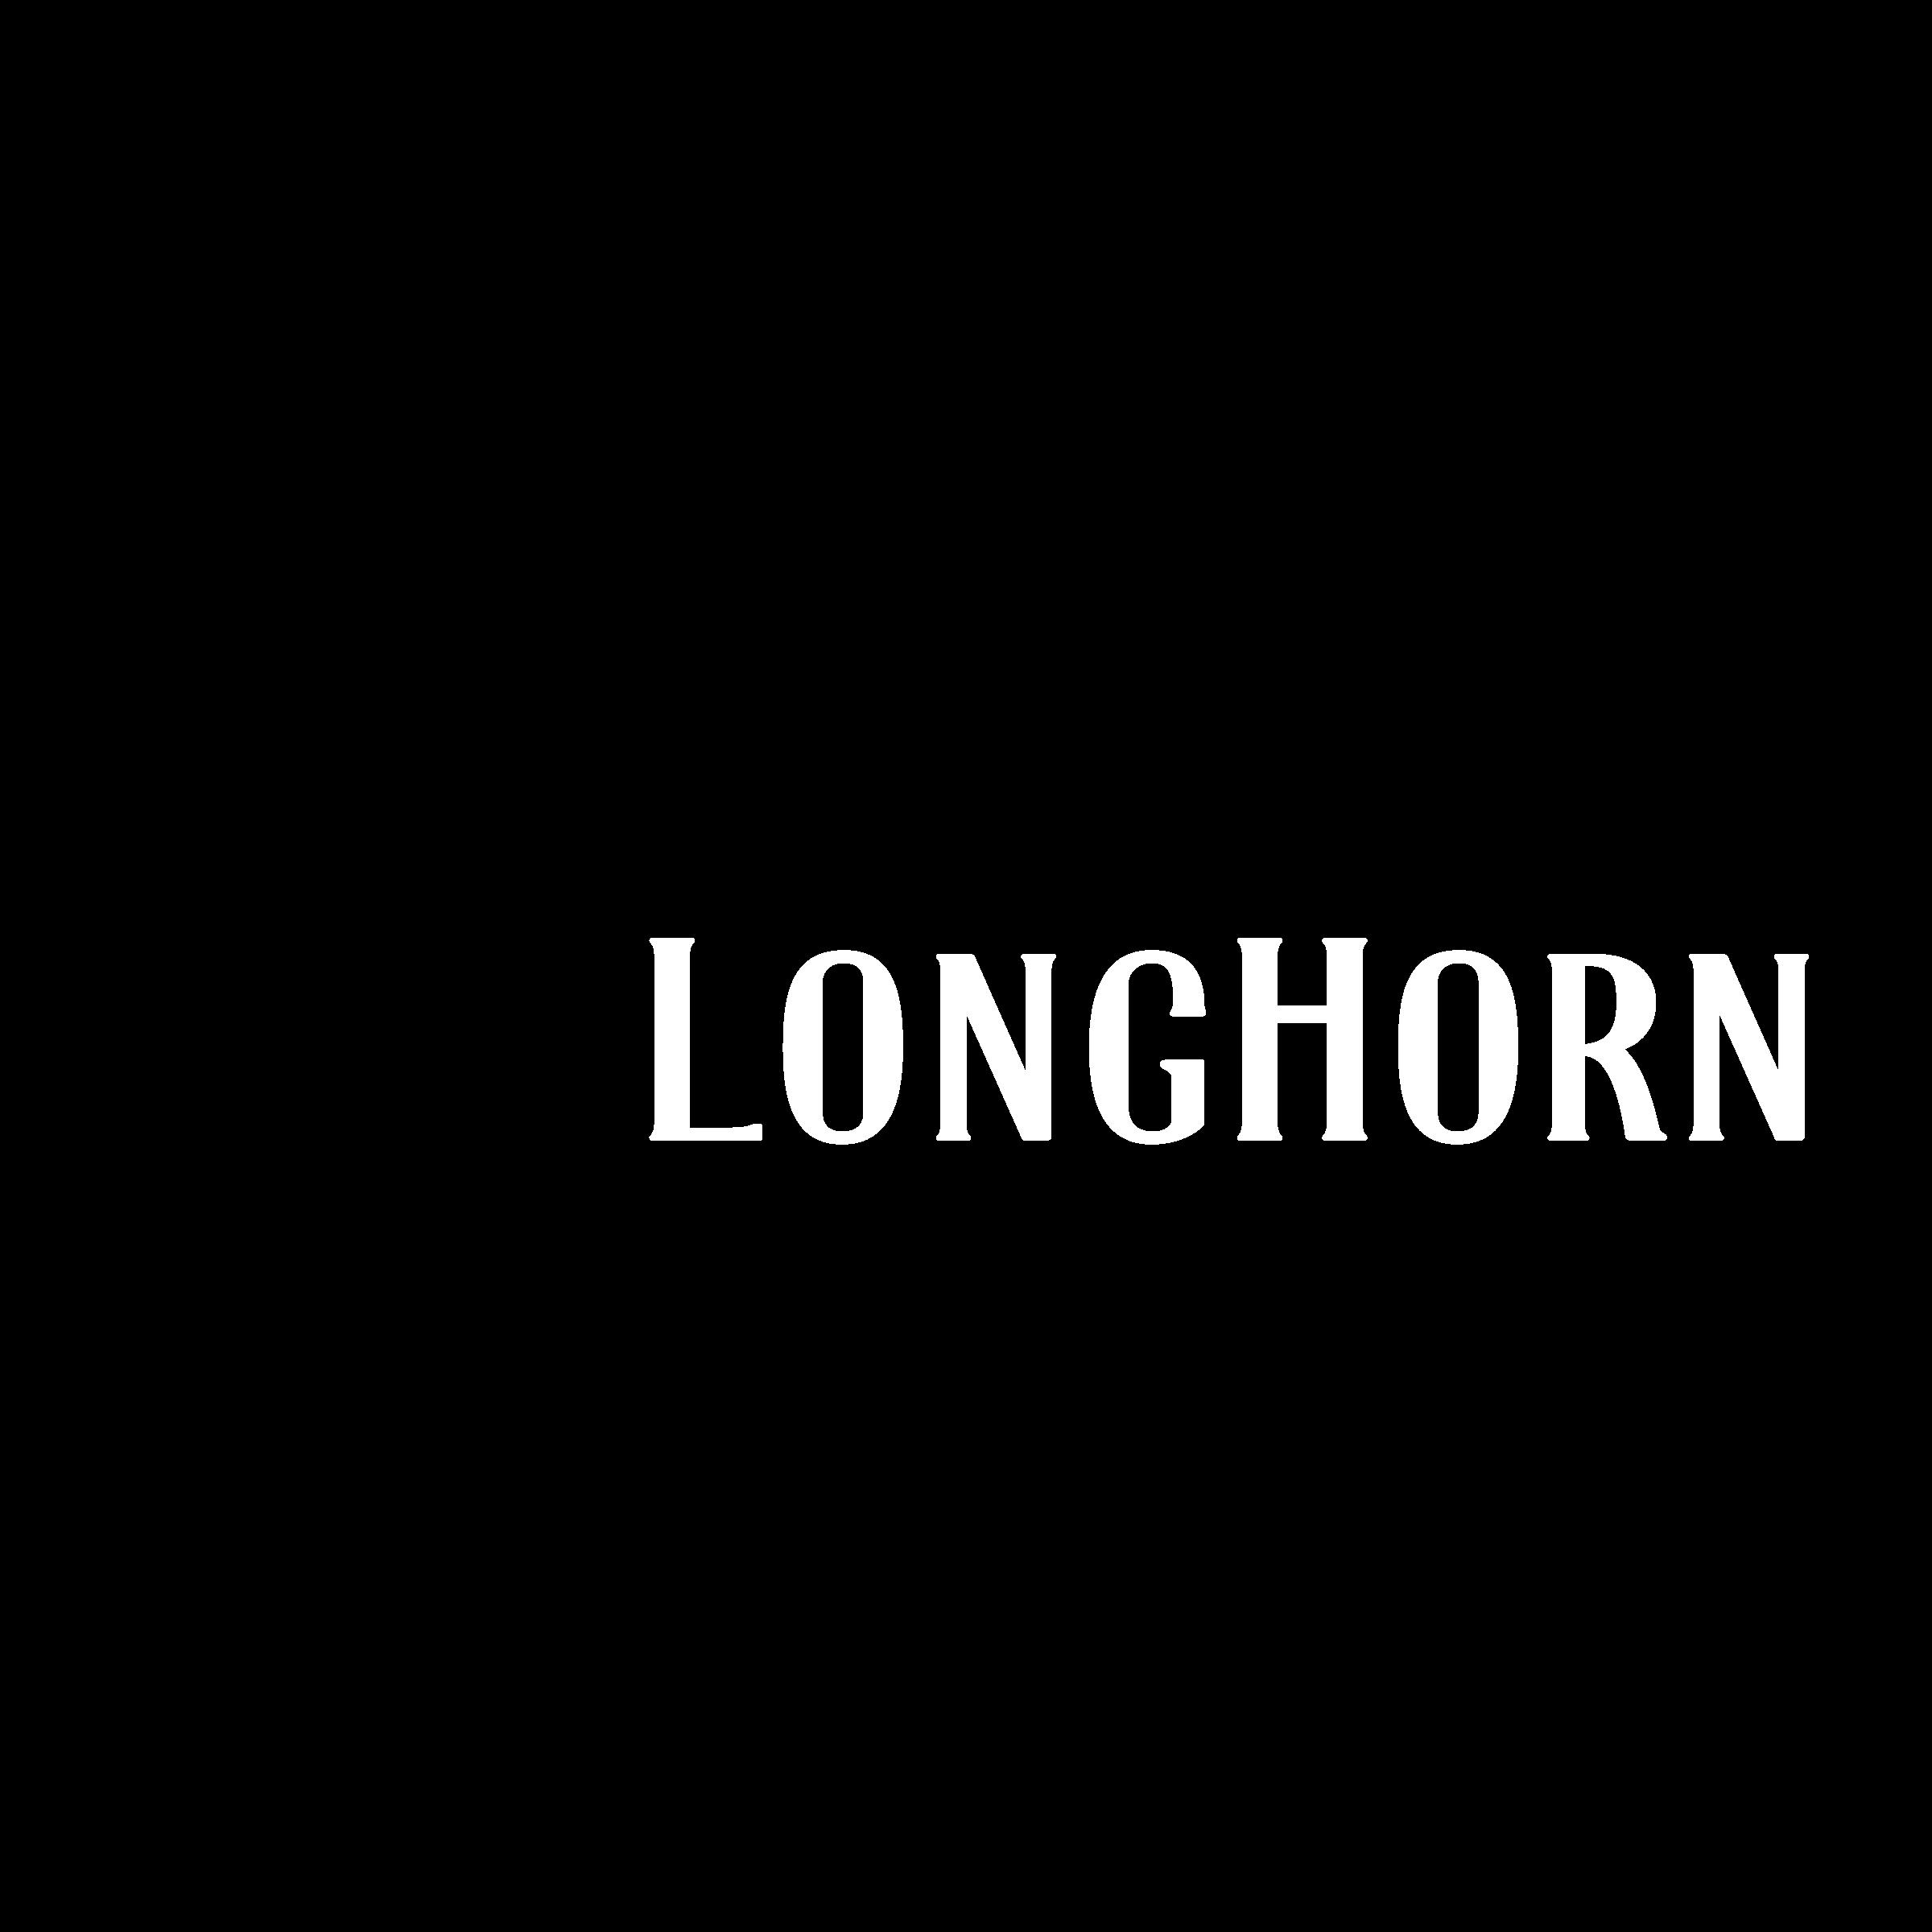 longhorn steakhouse logo png transparent svg vector freebie supply rh freebiesupply com longhorn steakhouse locations longhorn steakhouse mascot